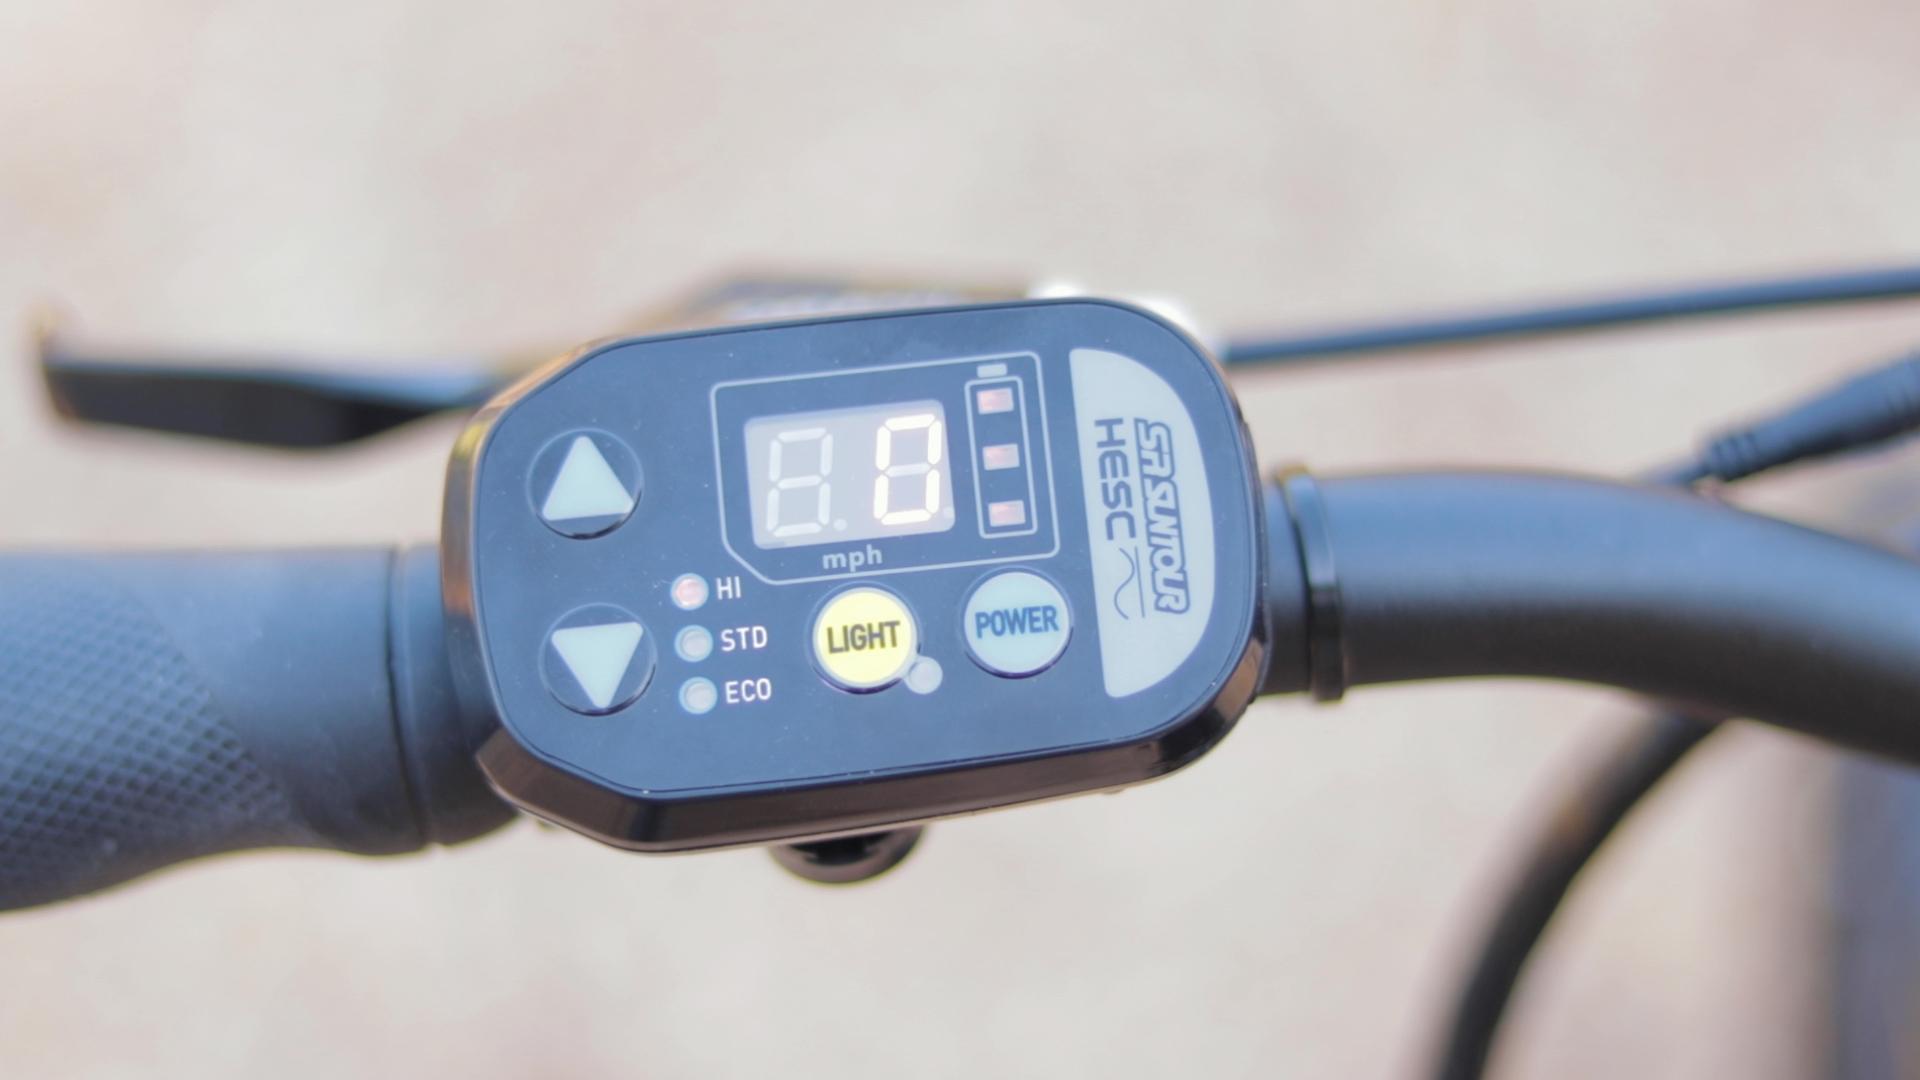 electrified-reviews-izip-e3-brio-electric-bike-review-shimano-hesc-display.jpg